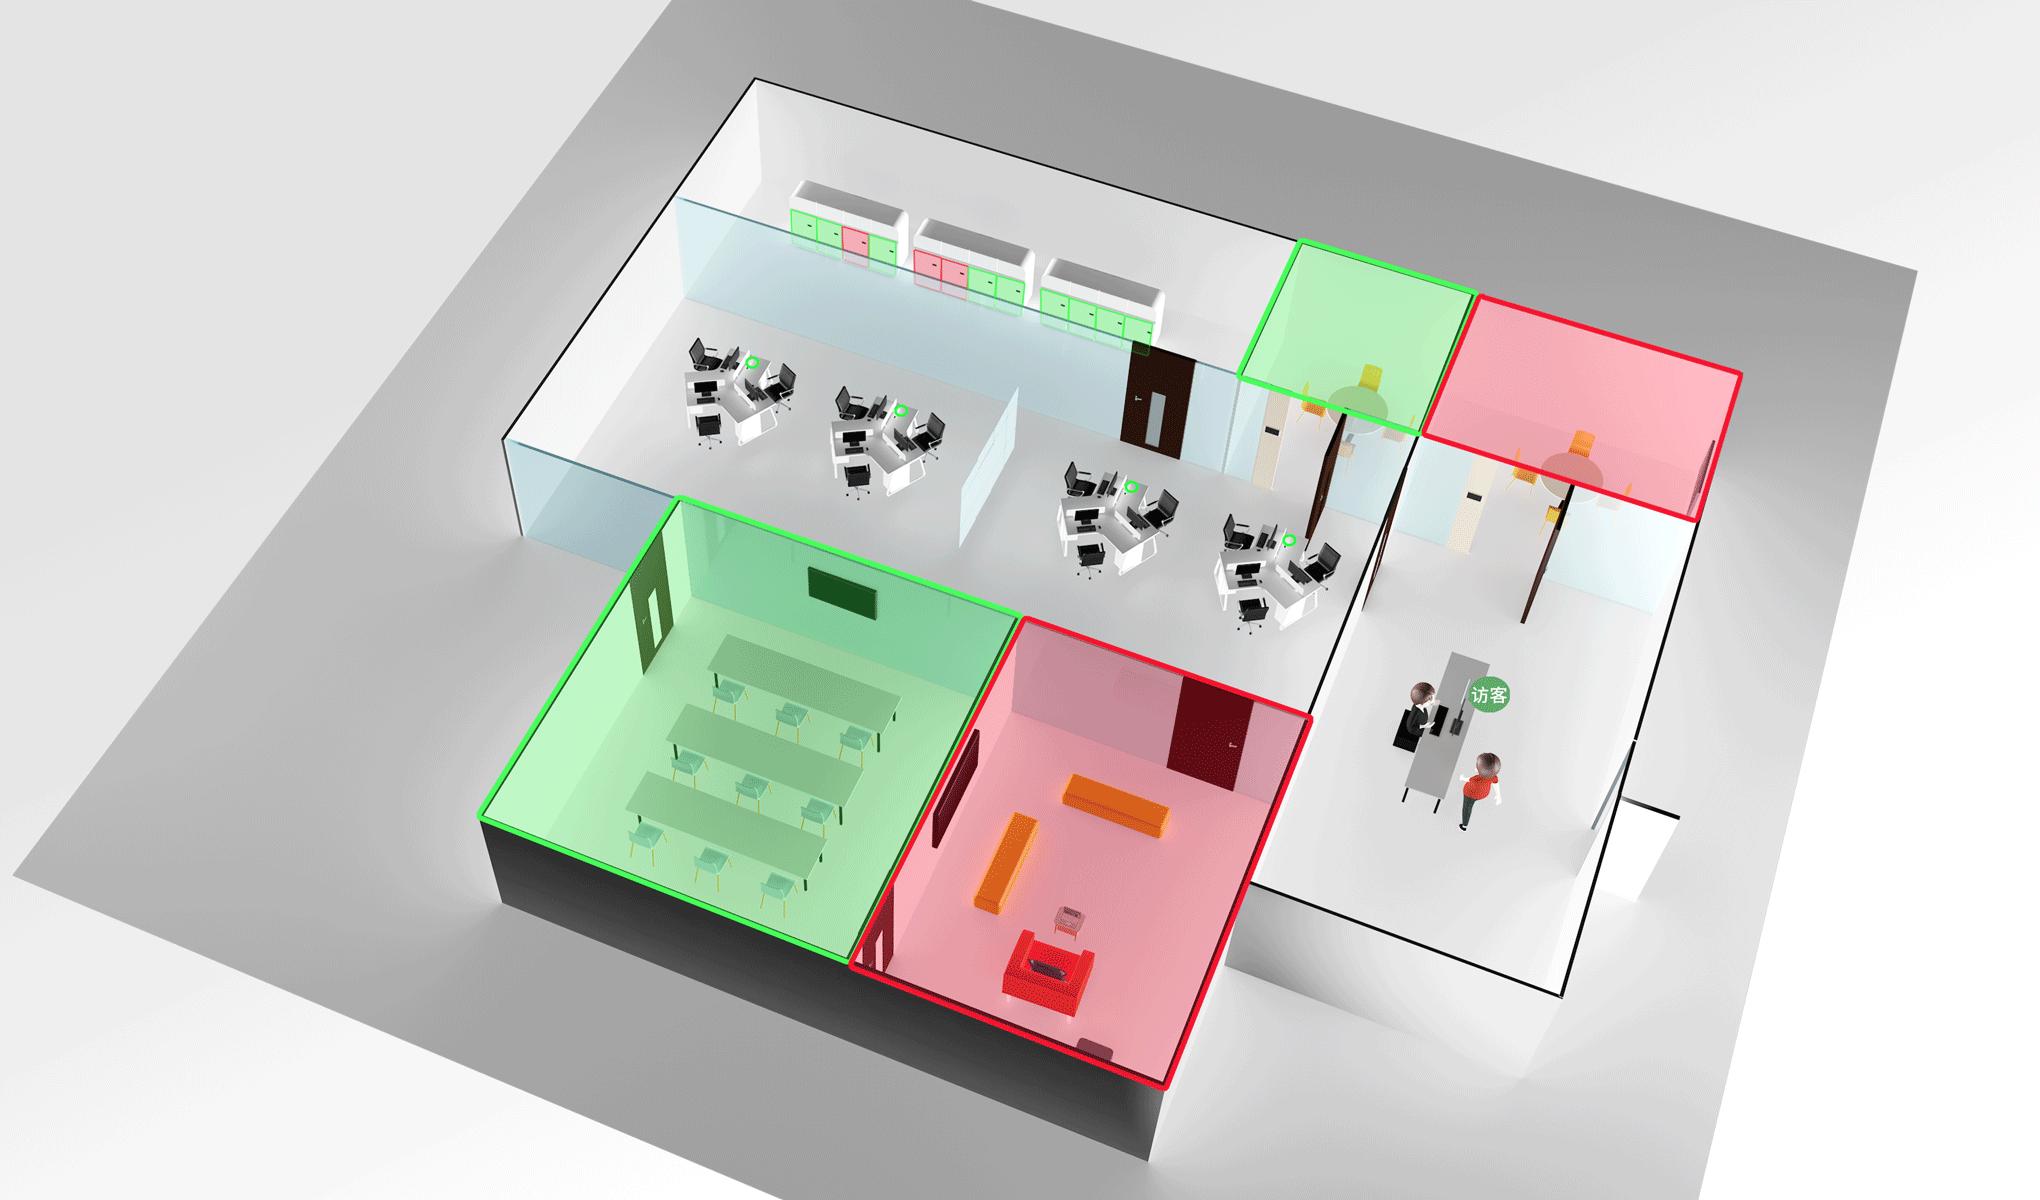 hvs官网smart-office-全场景-加线